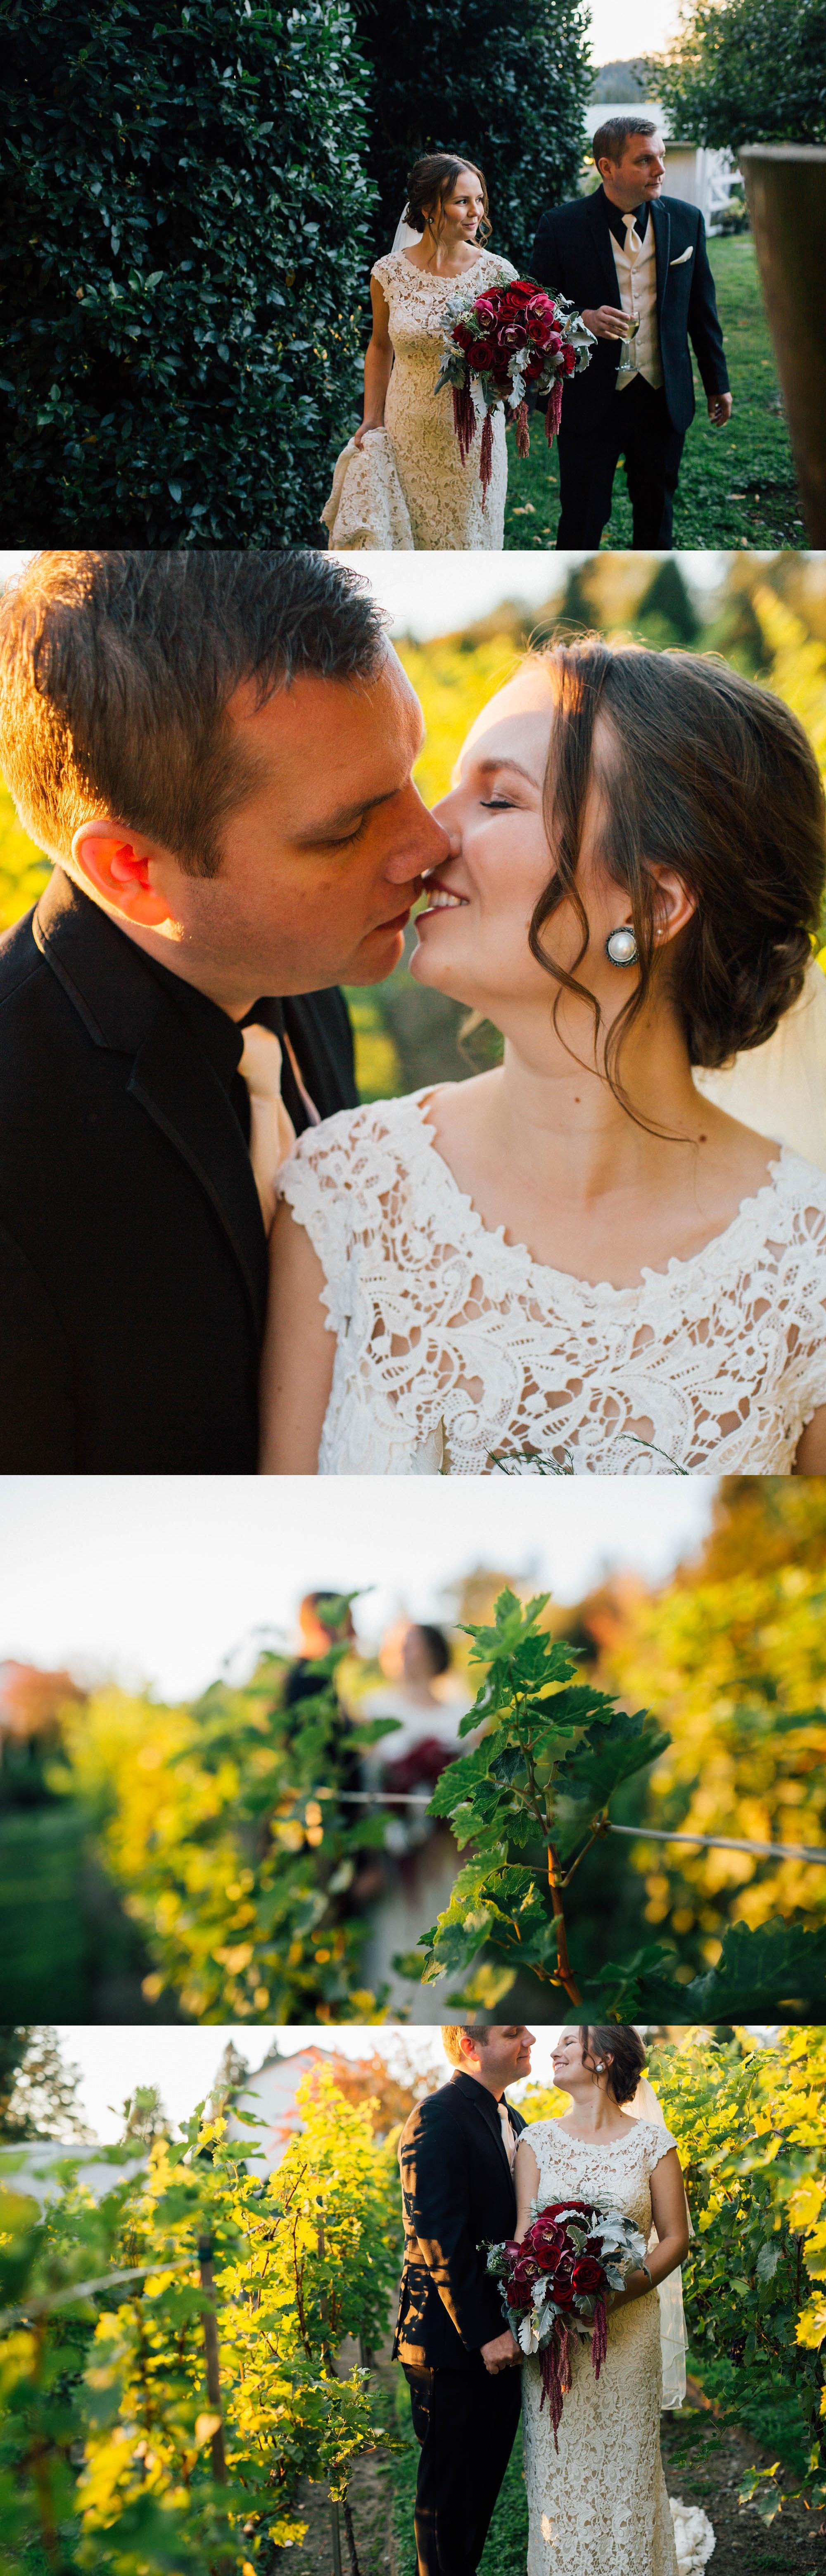 ashley_vos_seattle_ wedding_photographer_0196.jpg